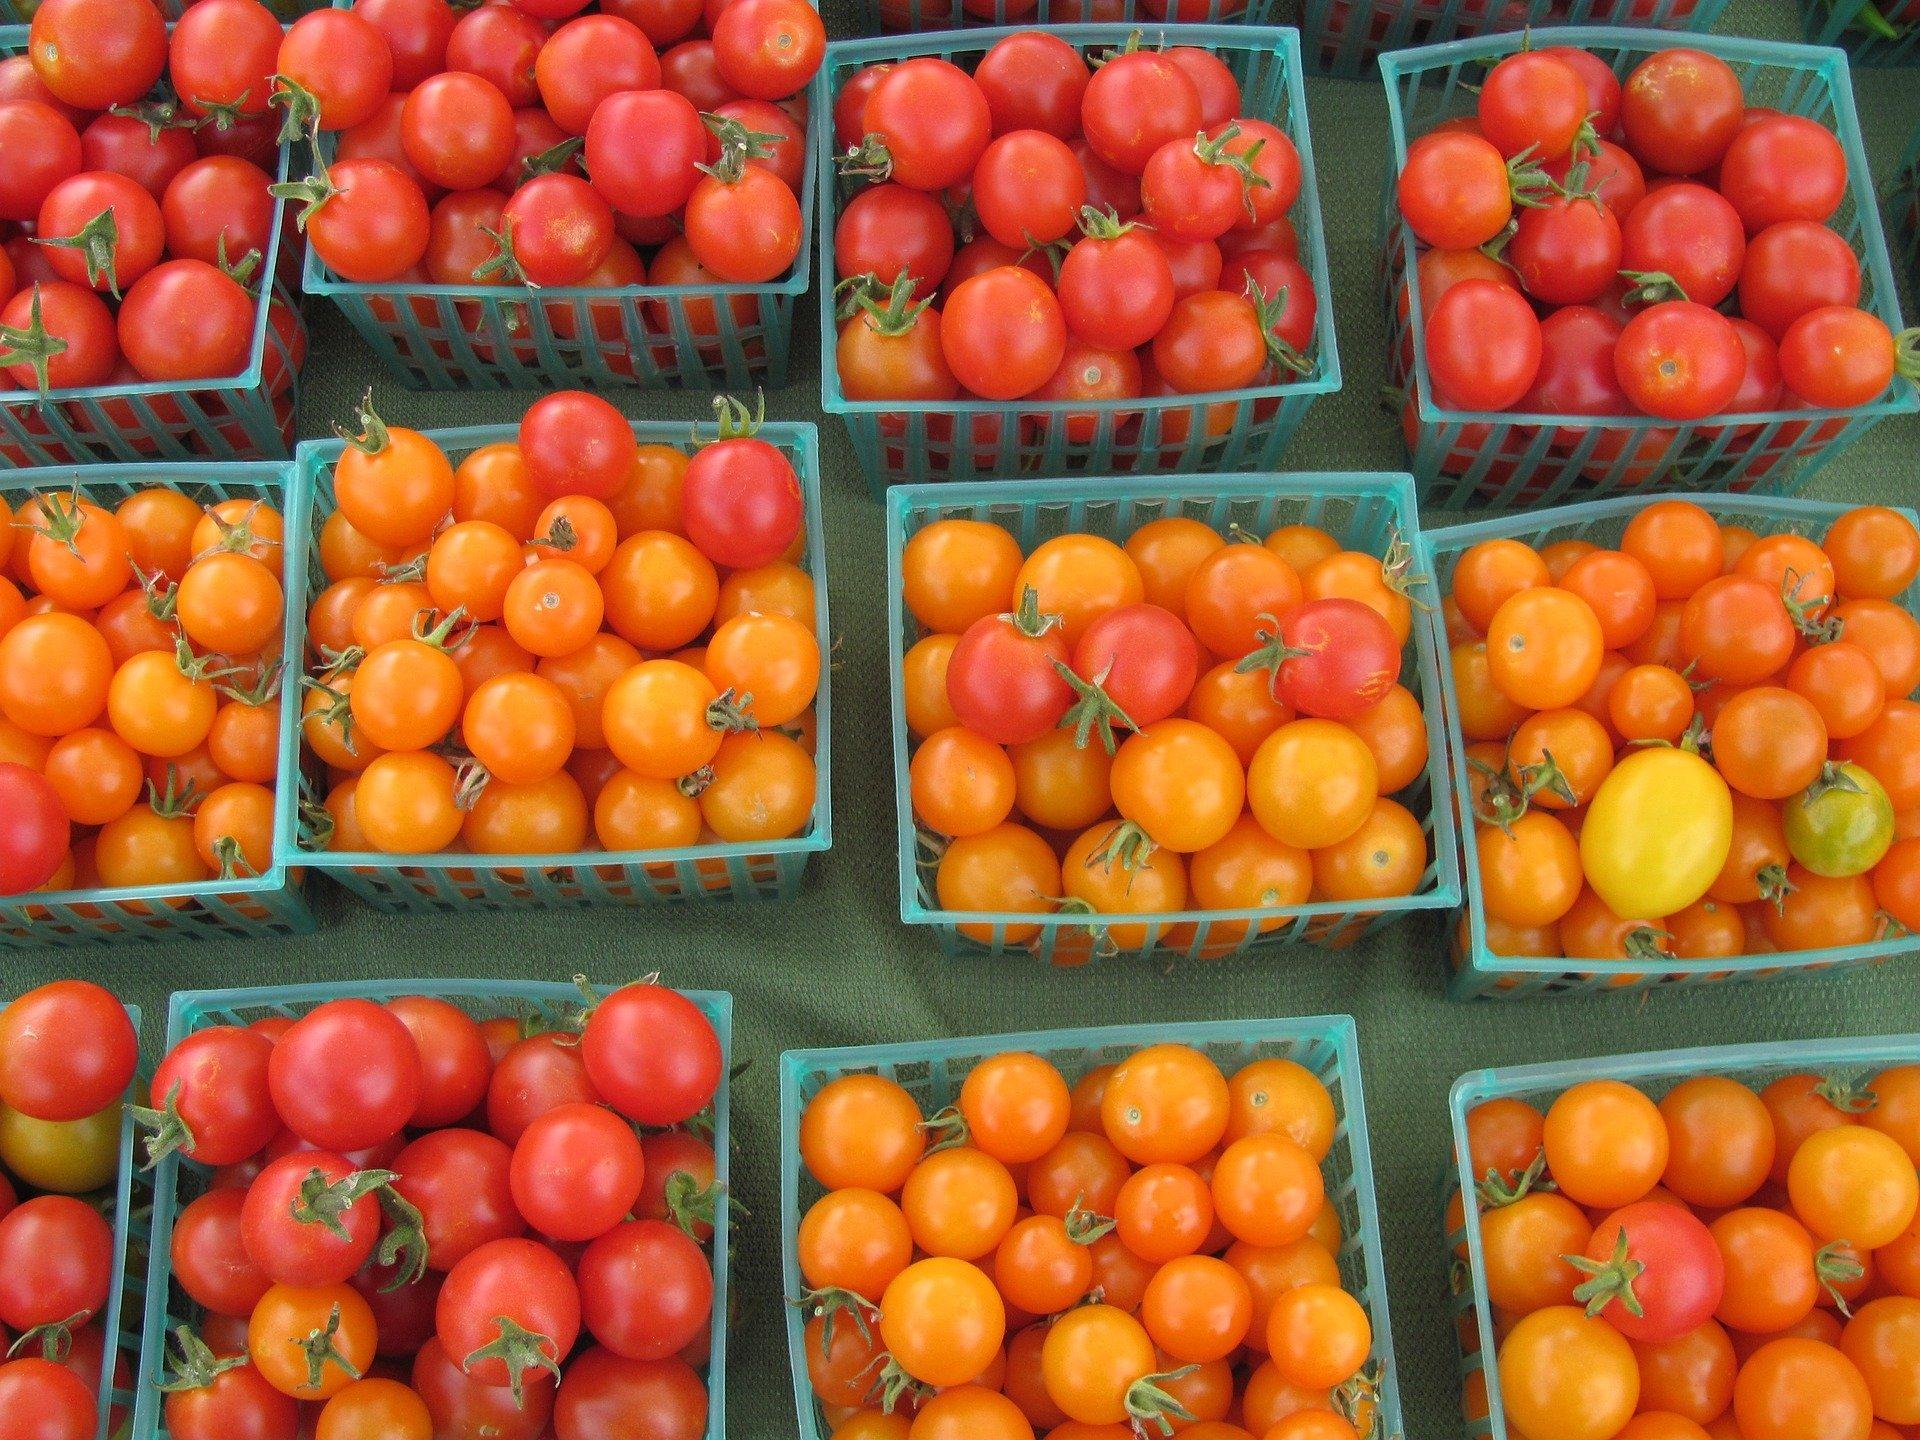 tomatoes-2087342_1920